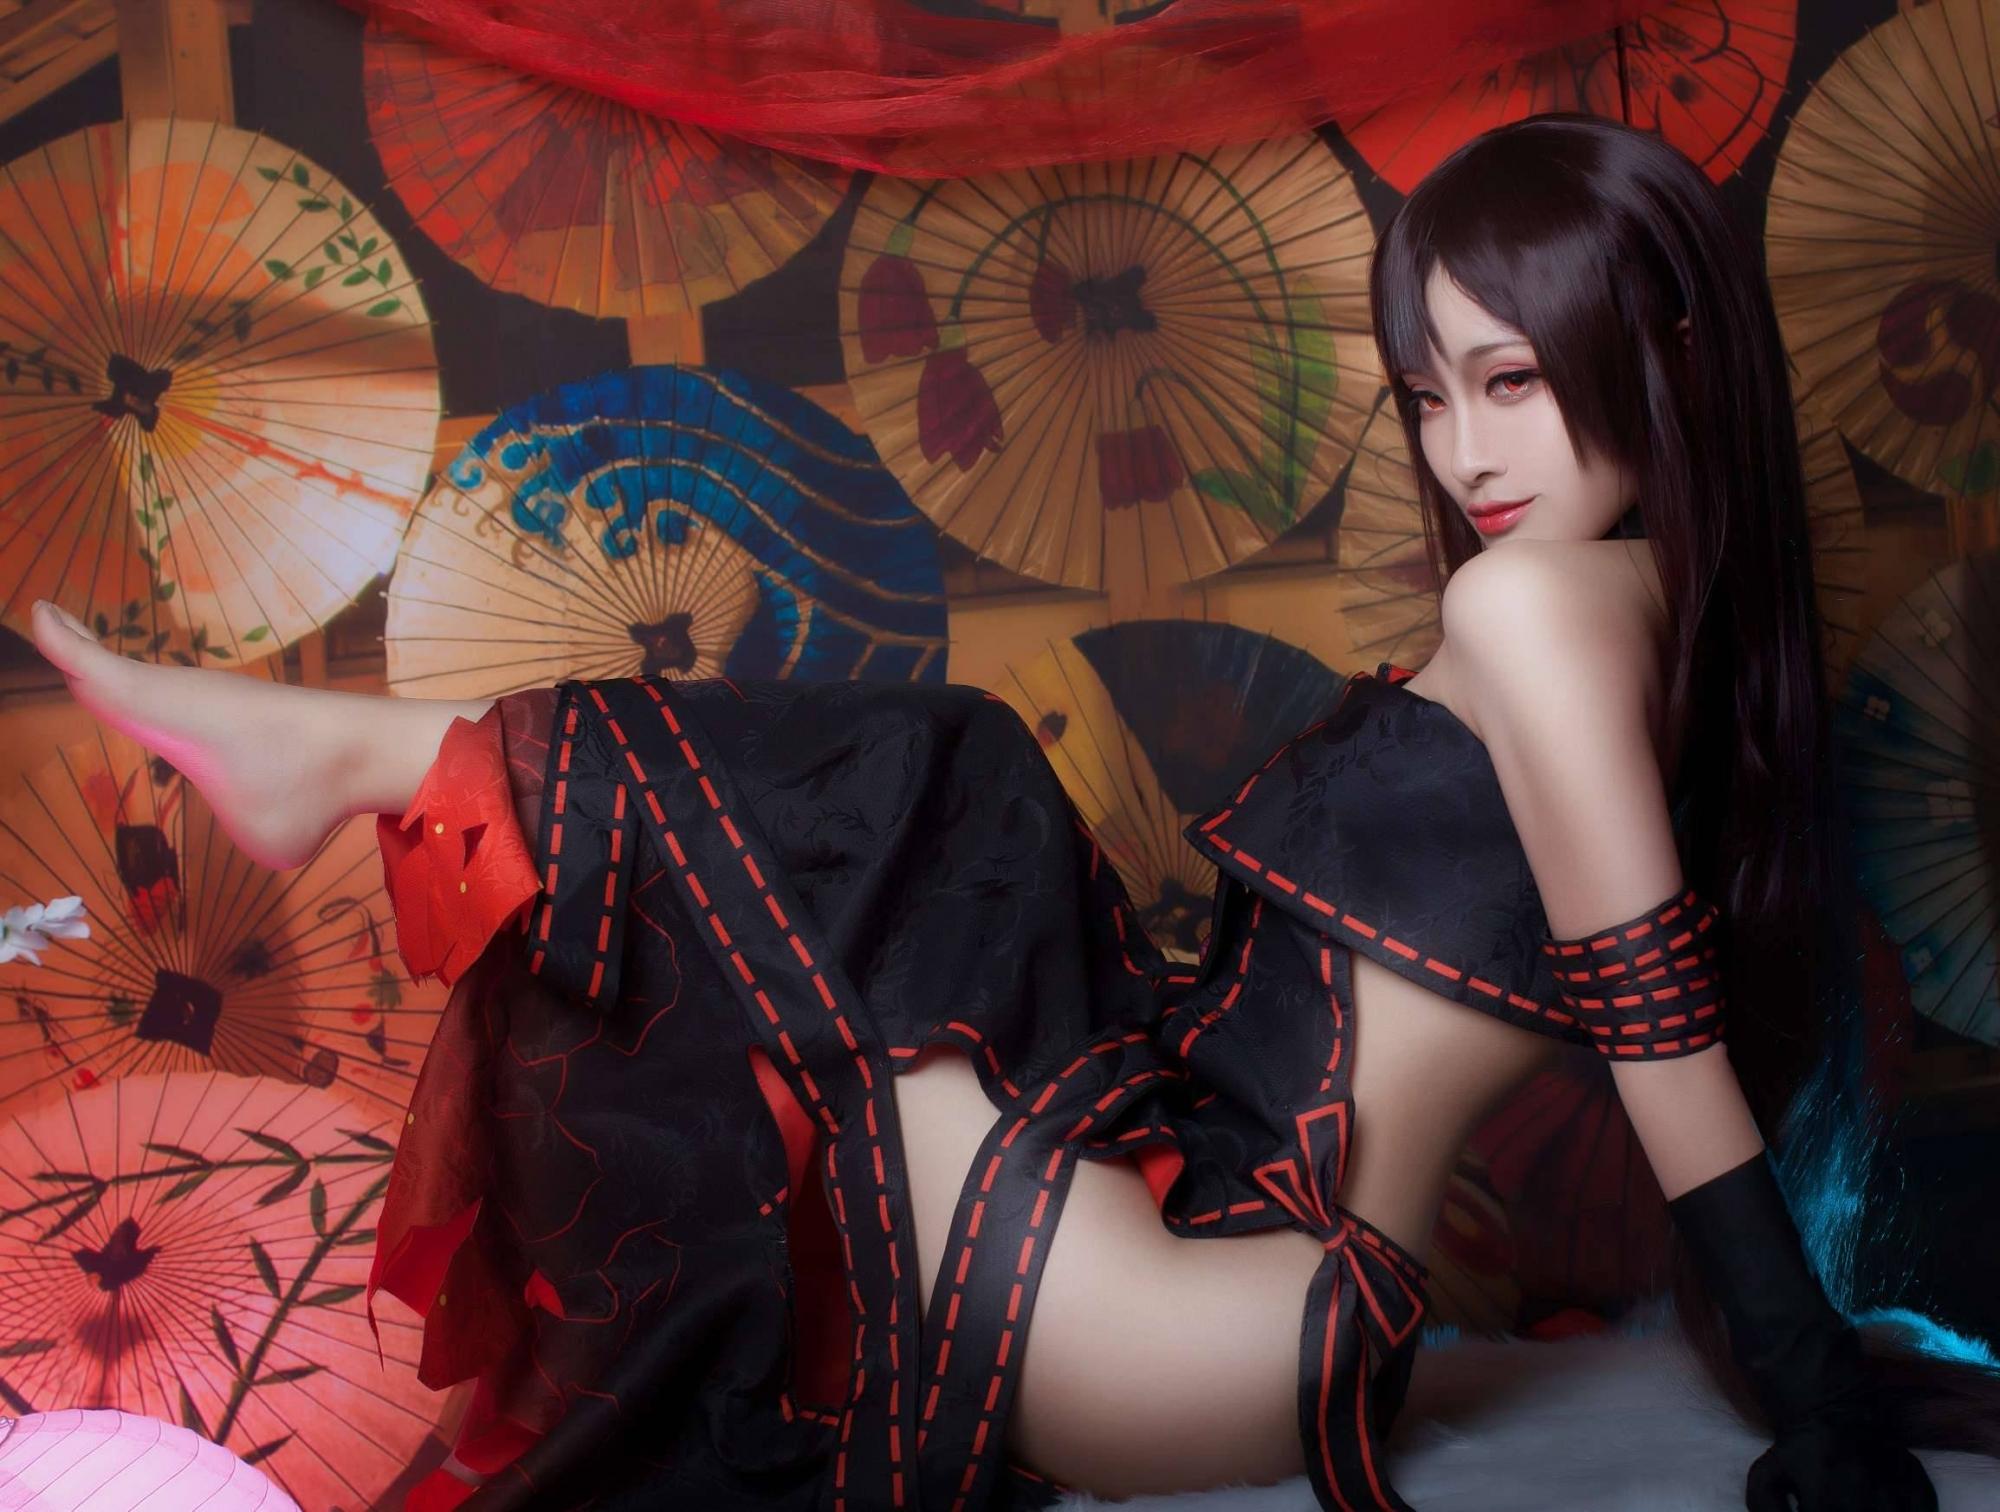 《Fate/GrandOrder》虞美人Cosplay【CN:洛璃LoLiSAMA】 (9P)-第9张